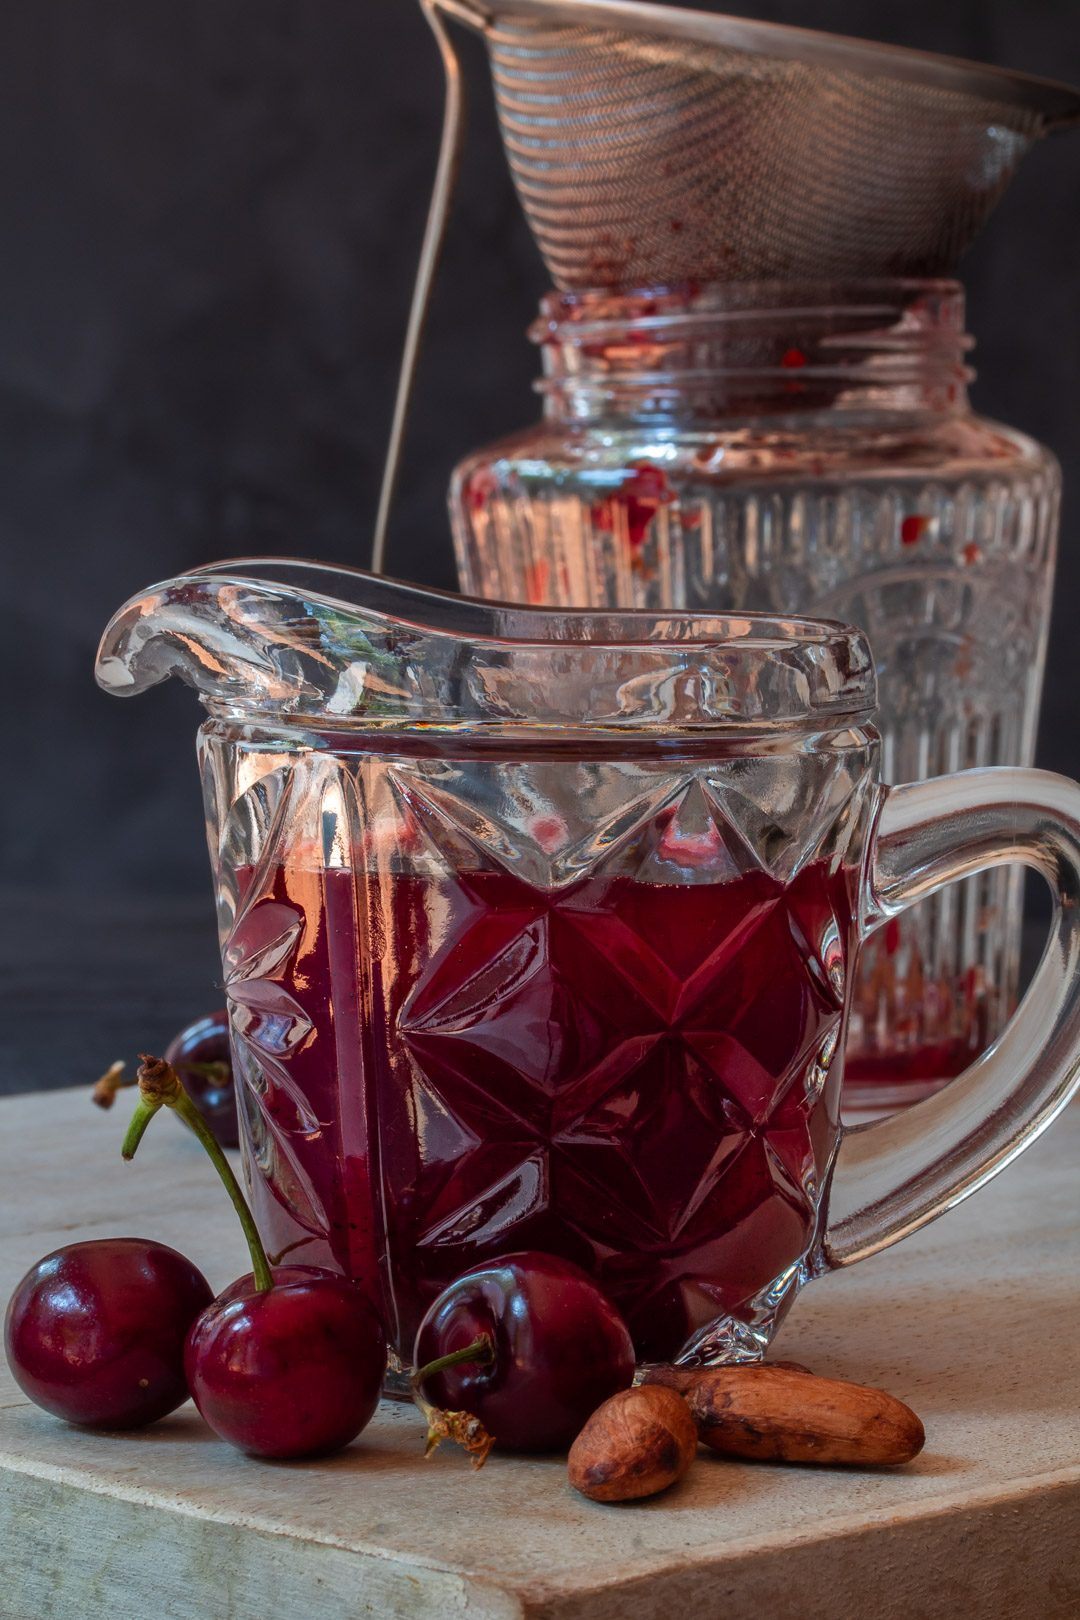 cherry shrub syrup in vintage cut glass jug for cherry shrub brandy daisy